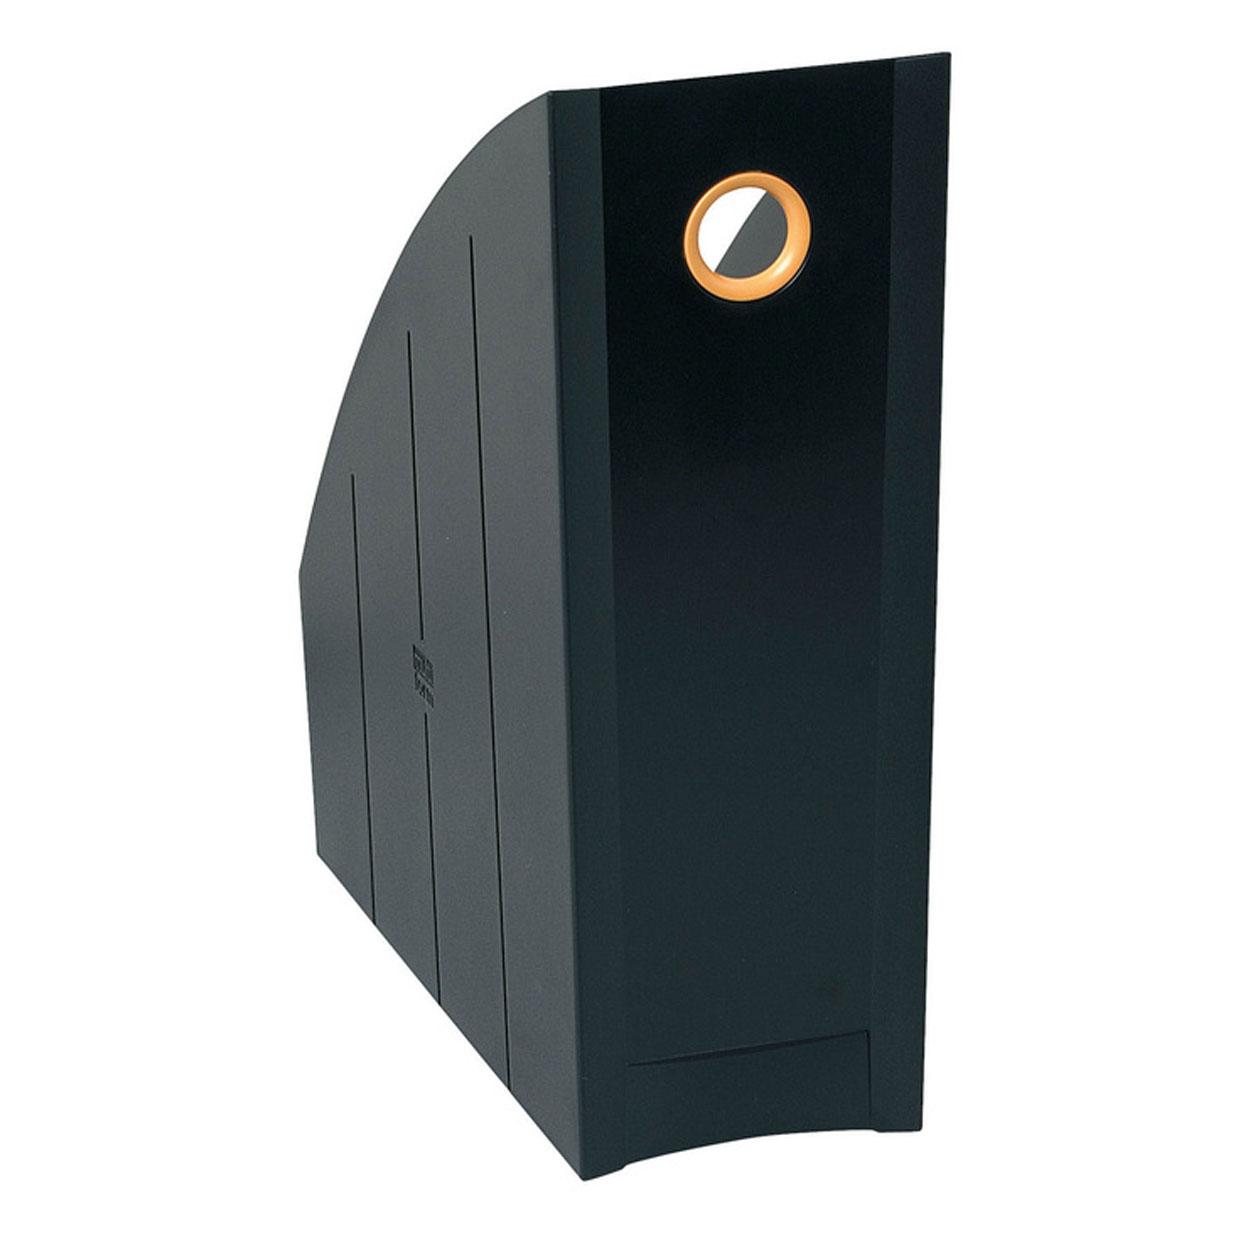 exacompta examag porte revues noir argent porte revues. Black Bedroom Furniture Sets. Home Design Ideas